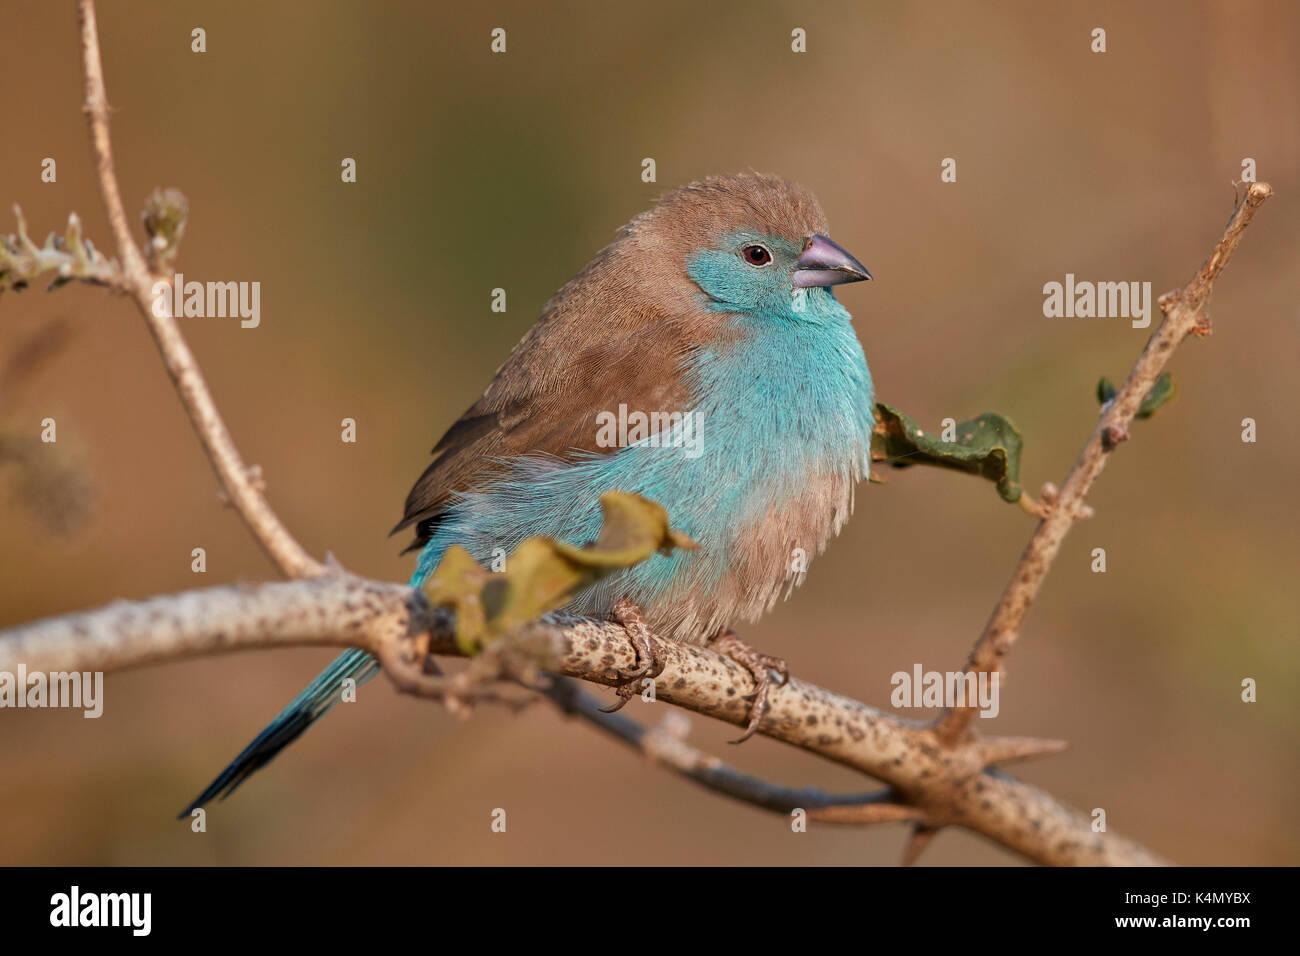 Azul (waxbill uraeginthus angolensis), el parque nacional Kruger, Sudáfrica, África Foto de stock